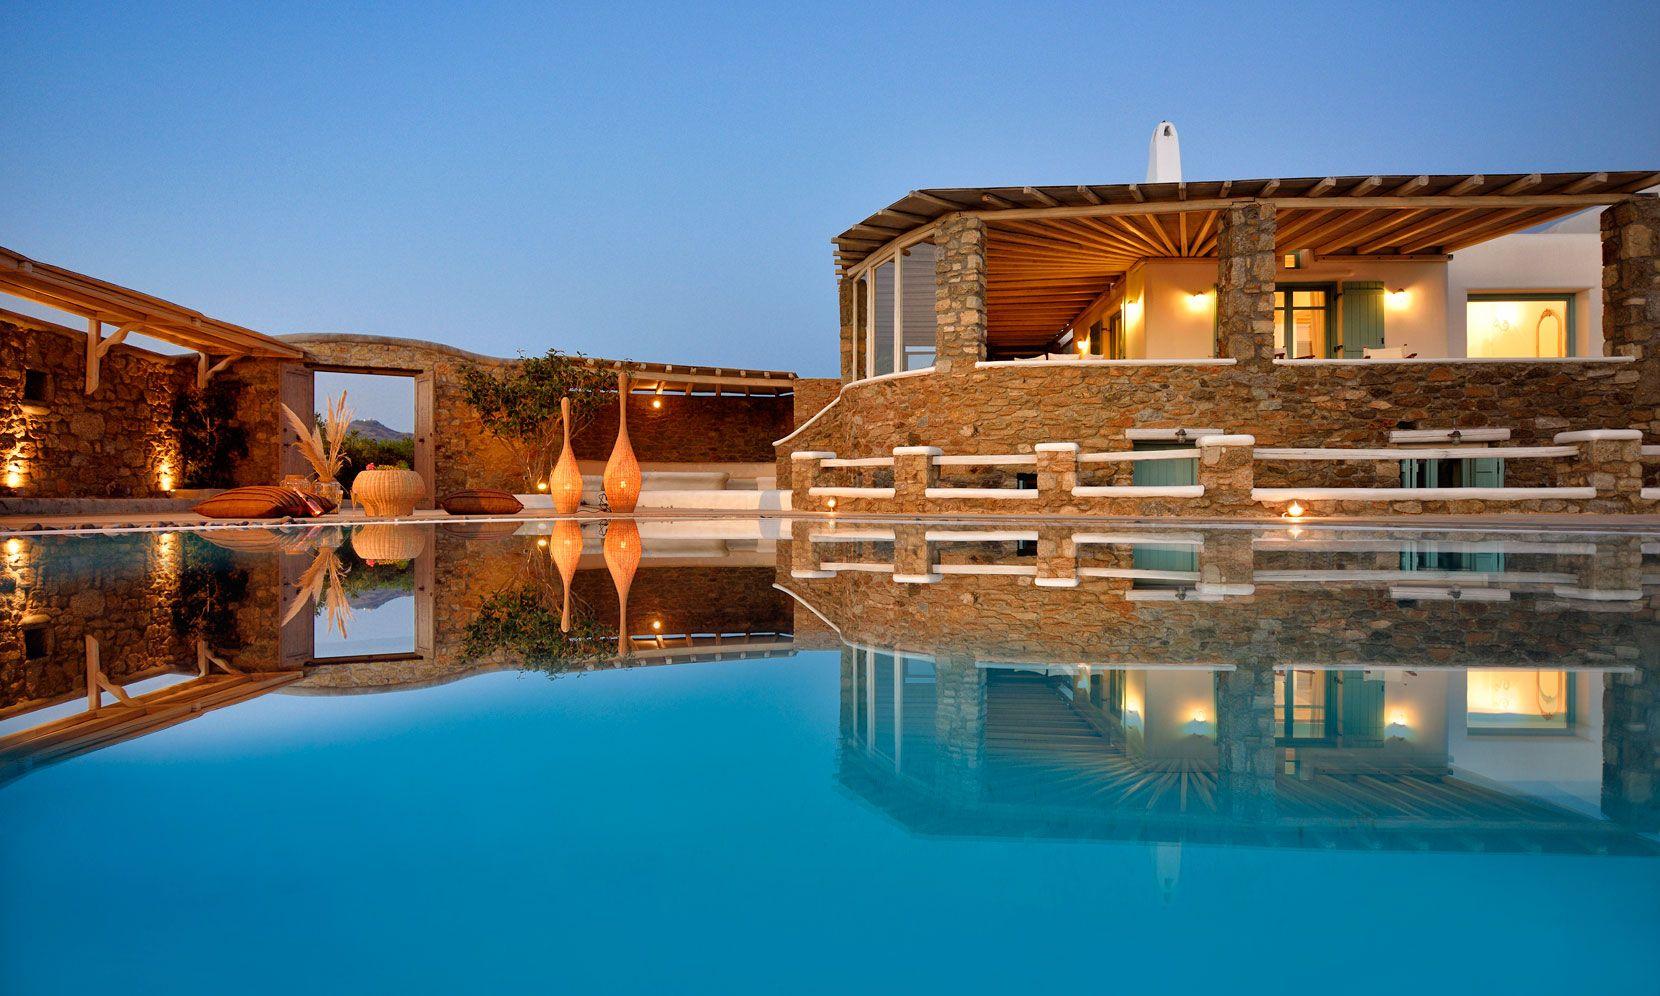 Mykonos Villa Amber jumbotron image